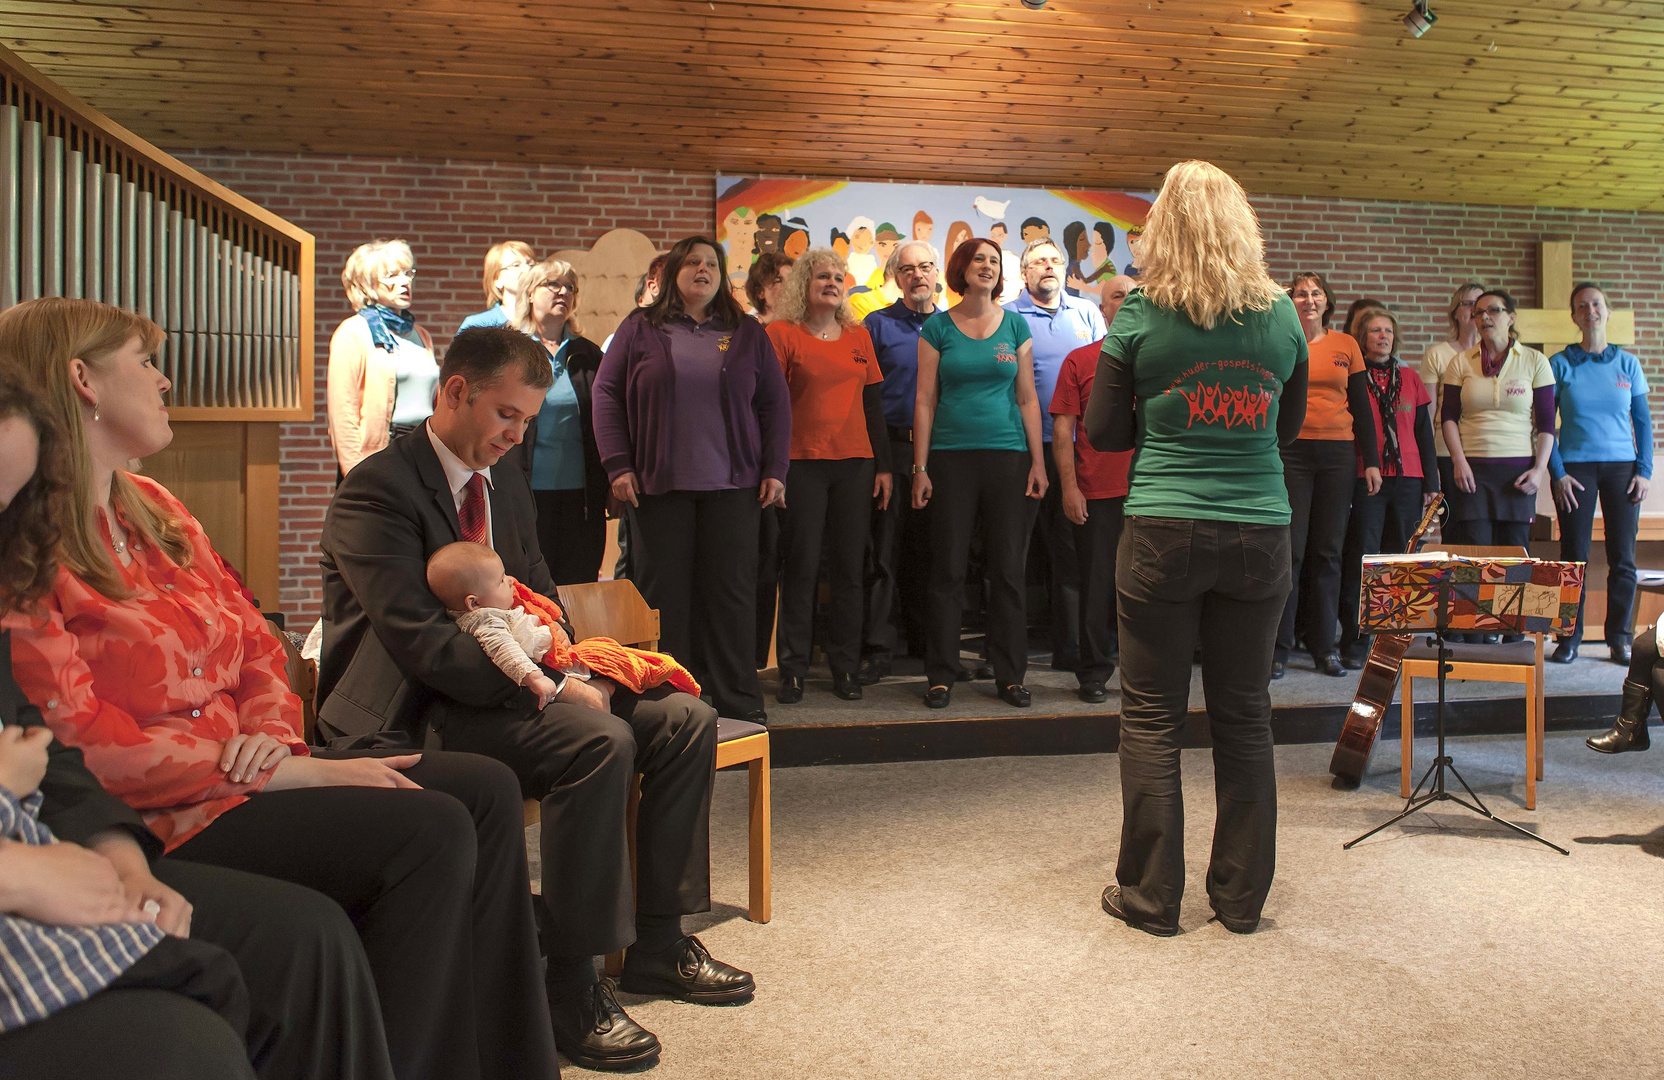 Huder Gospel Singers bei der Taufe